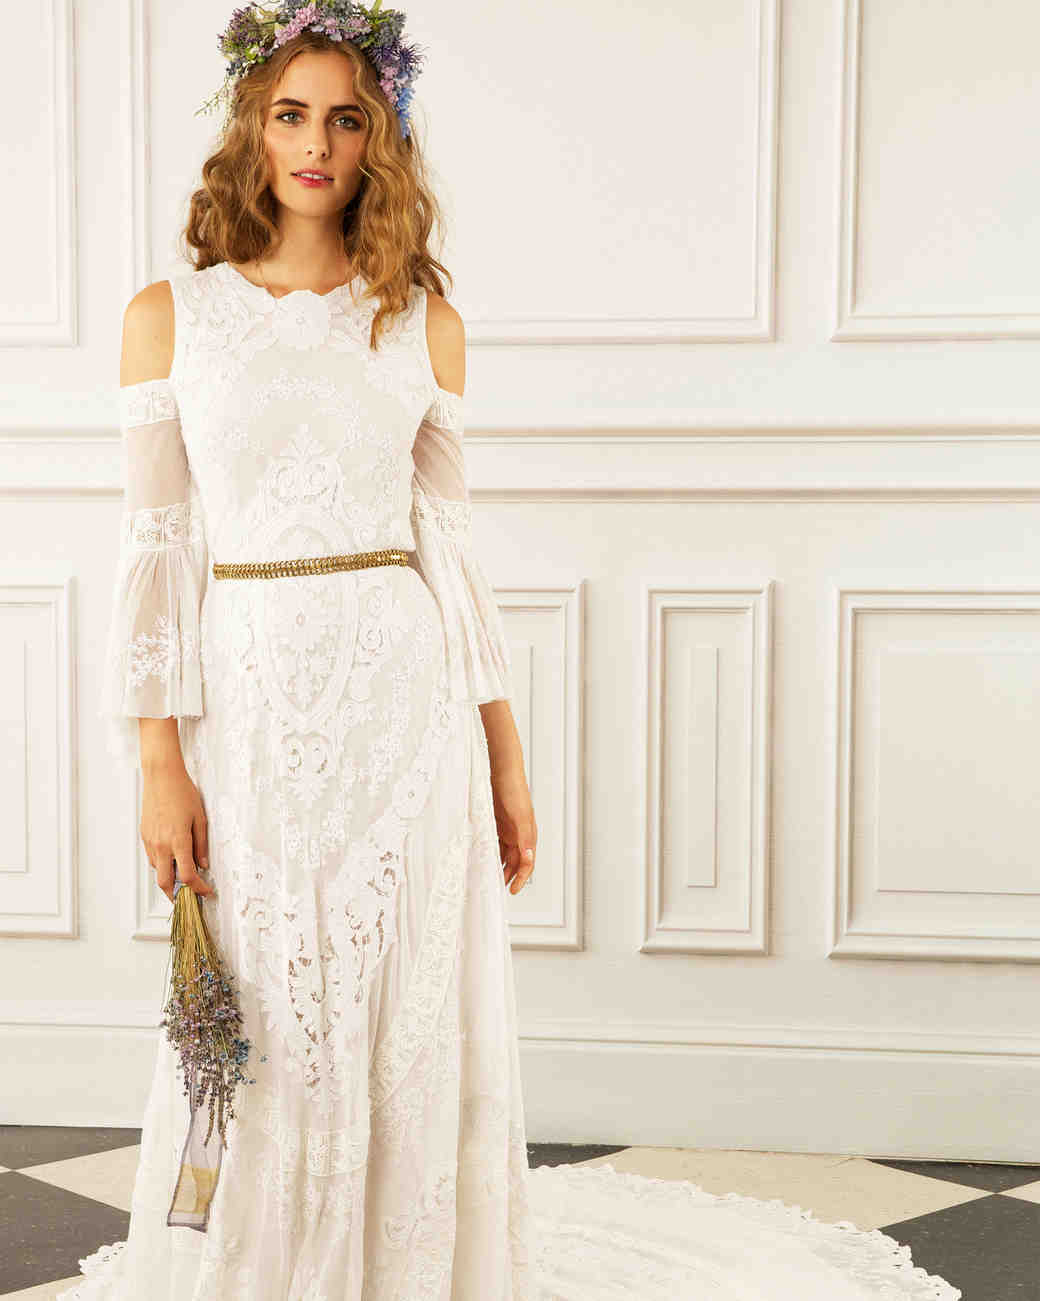 maria korovilas wedding dress spring 2017 shoulder cut out